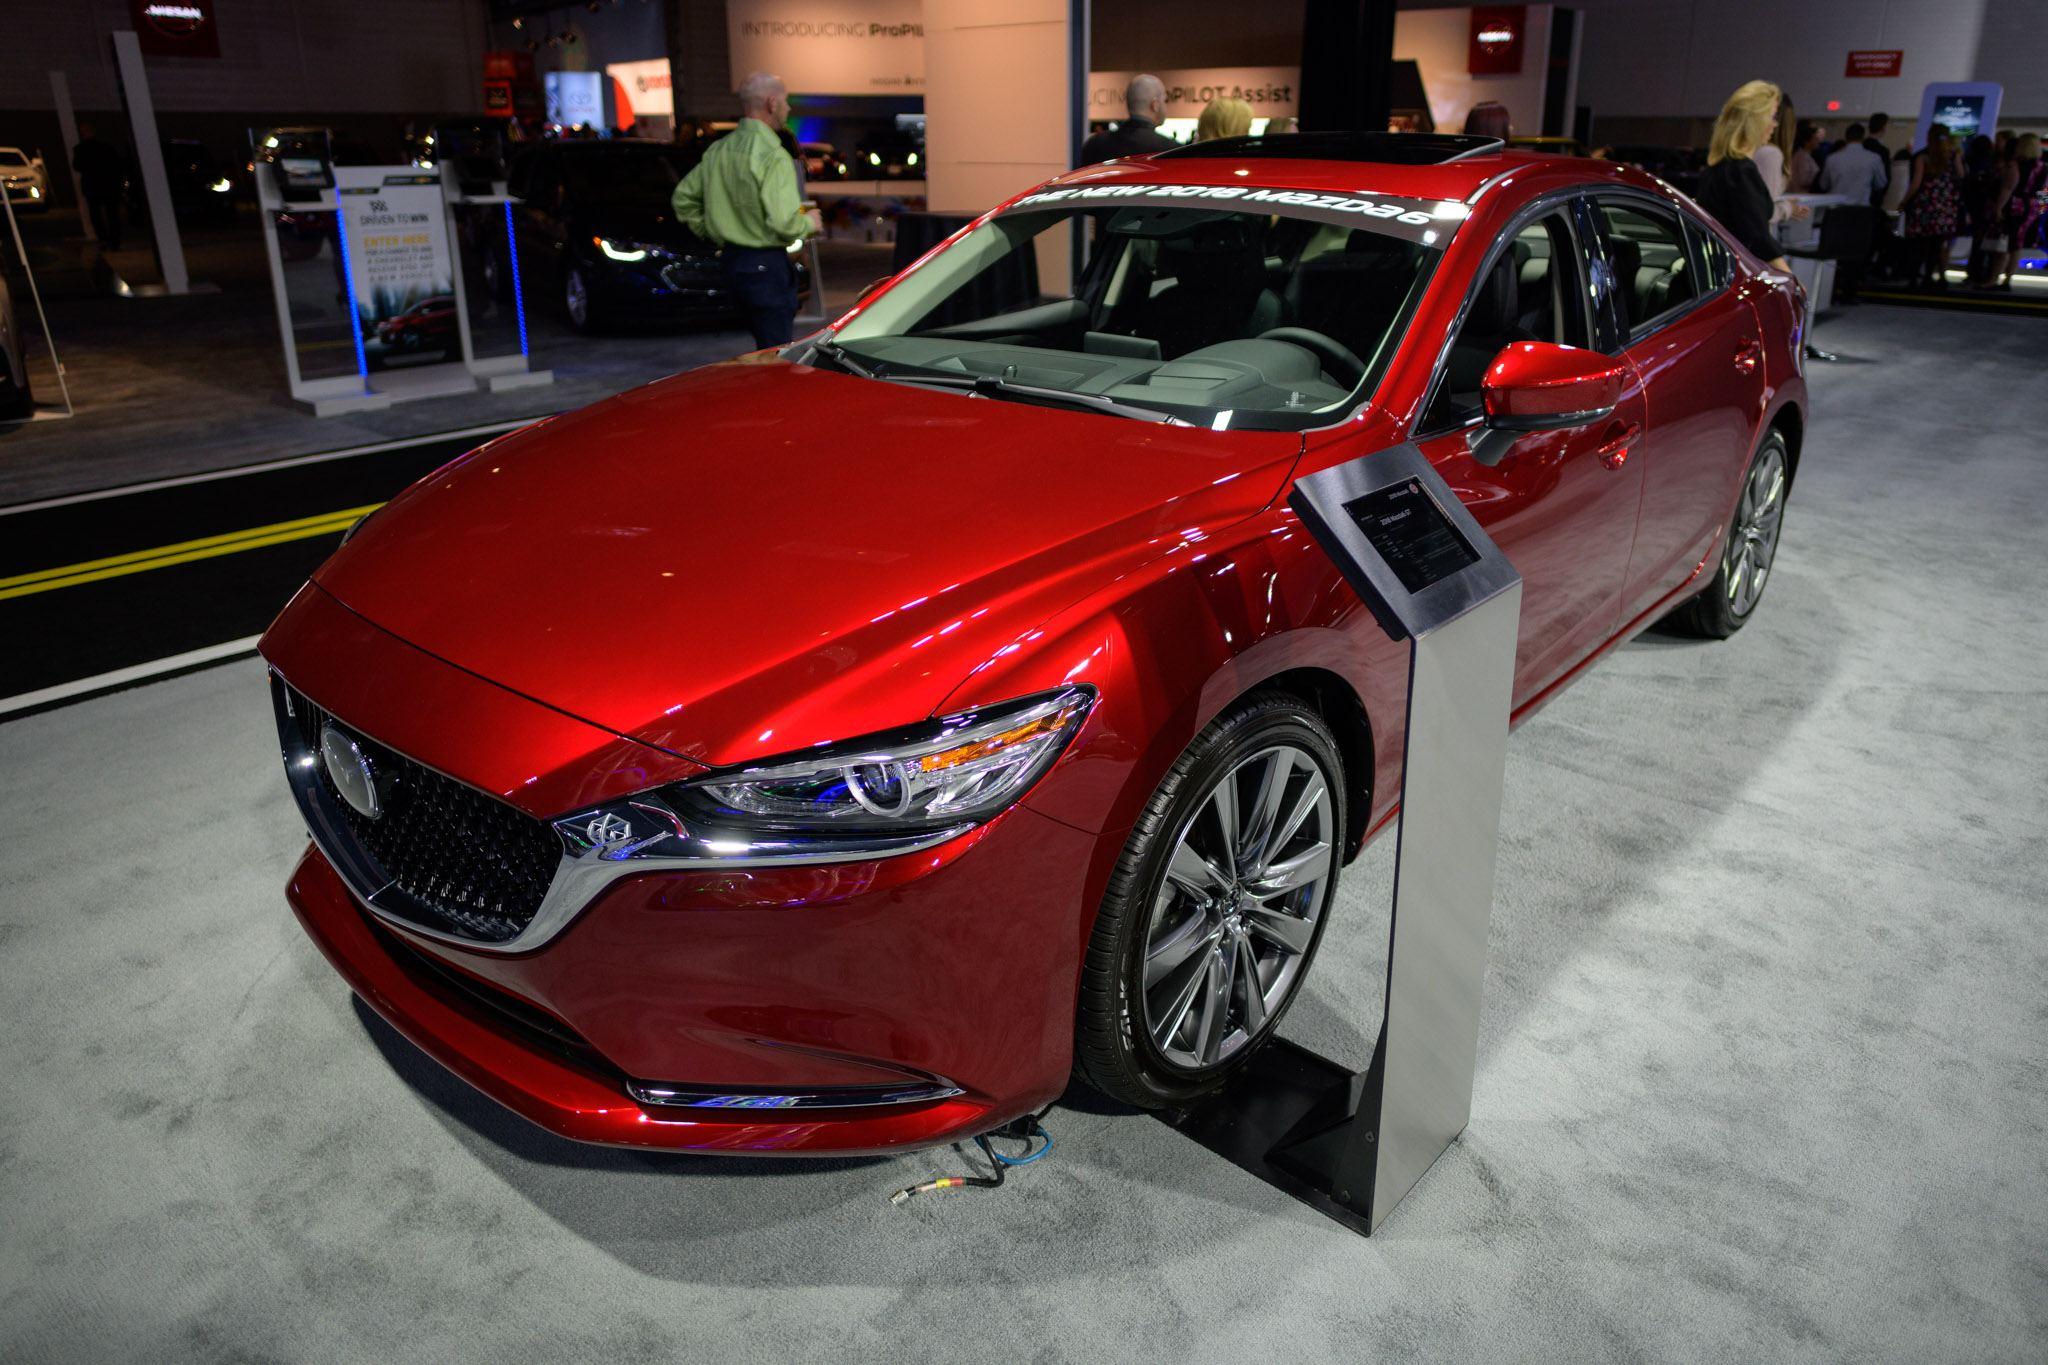 Edmonton Motorshow: The All-New 2018 Mazda6 | Car Reviews